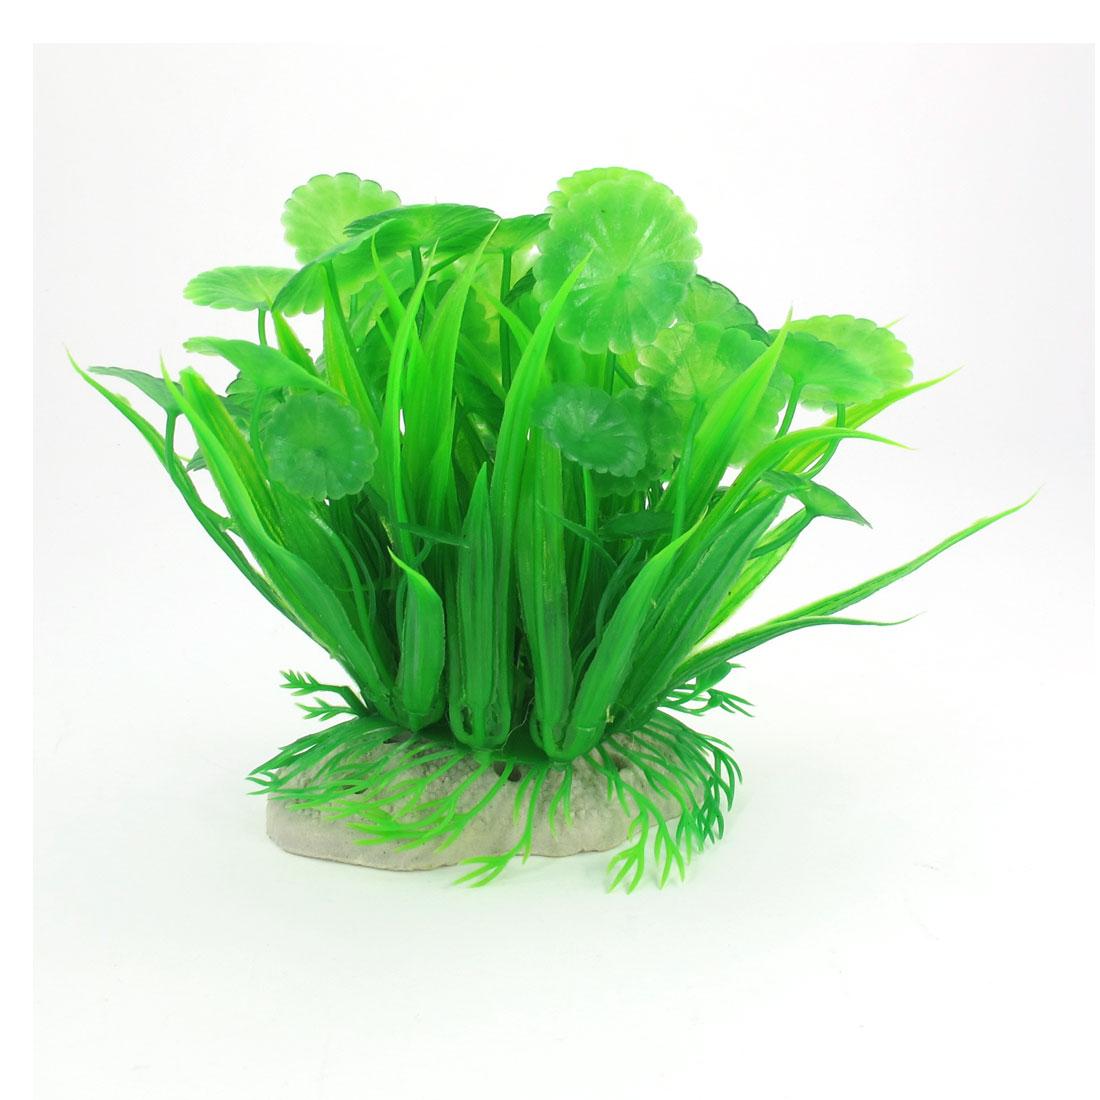 "3.9"" High Green Emulational Plastic Water Plant Grass for Fish Tank Aquarium"